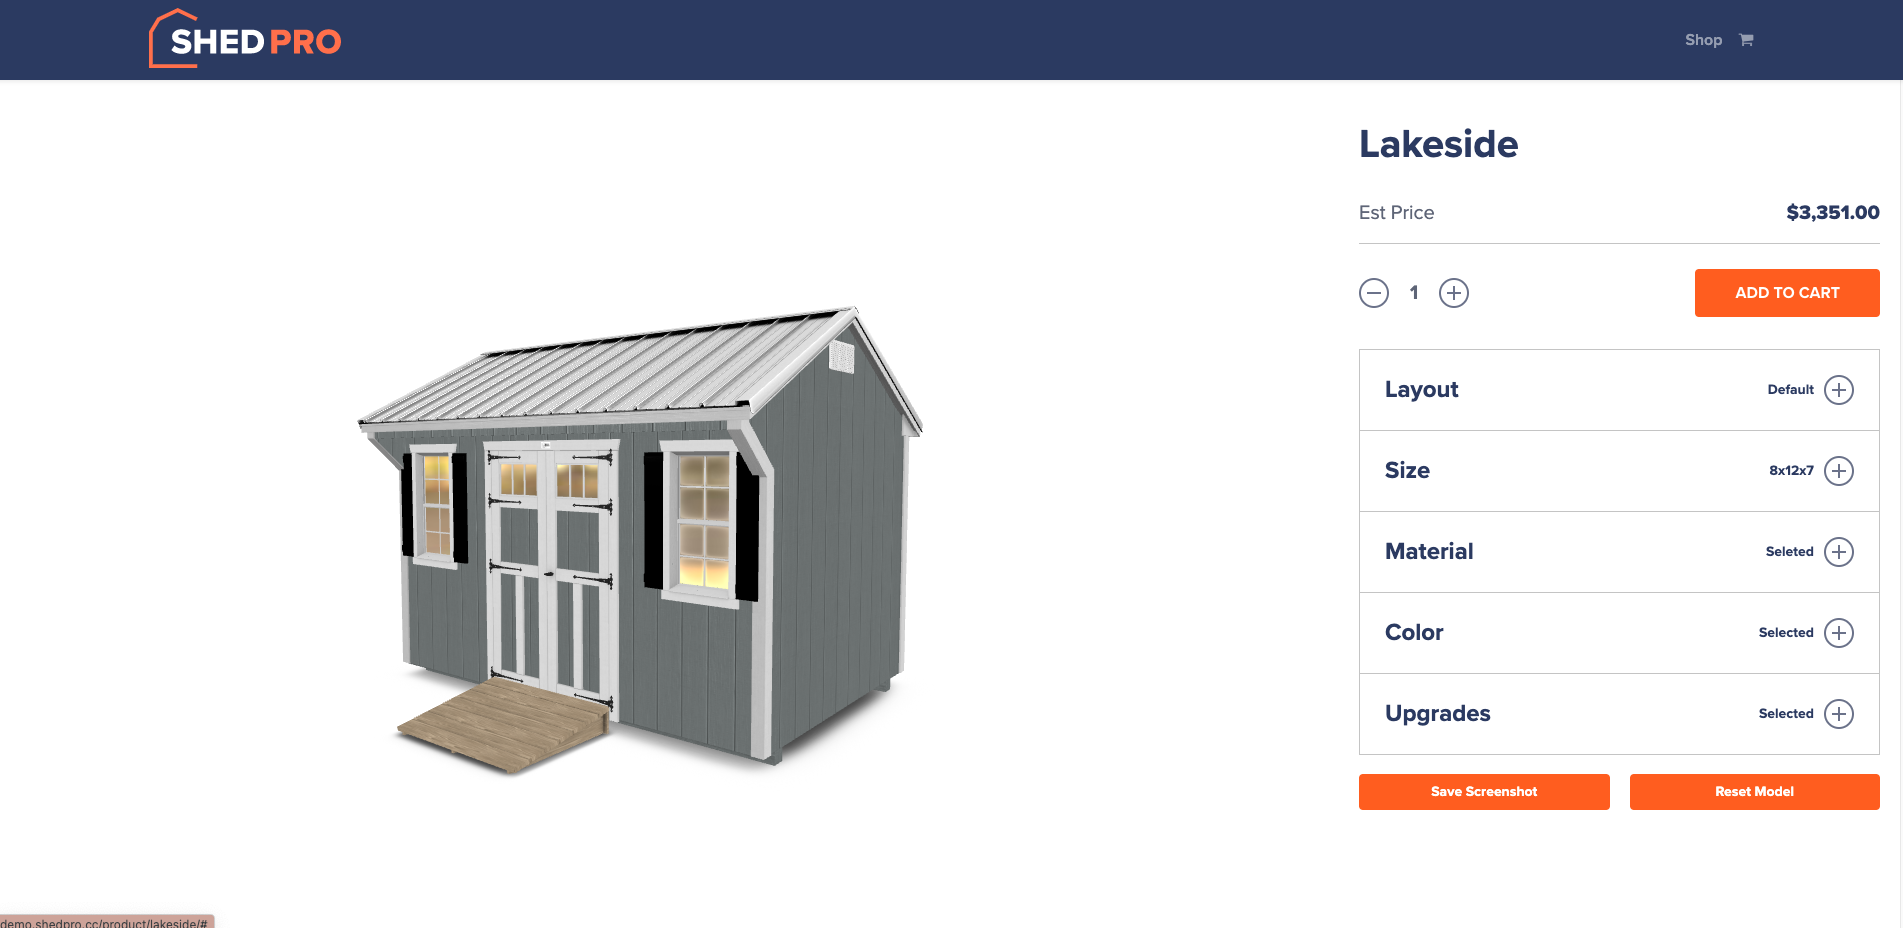 ShedPro shed builder configurator